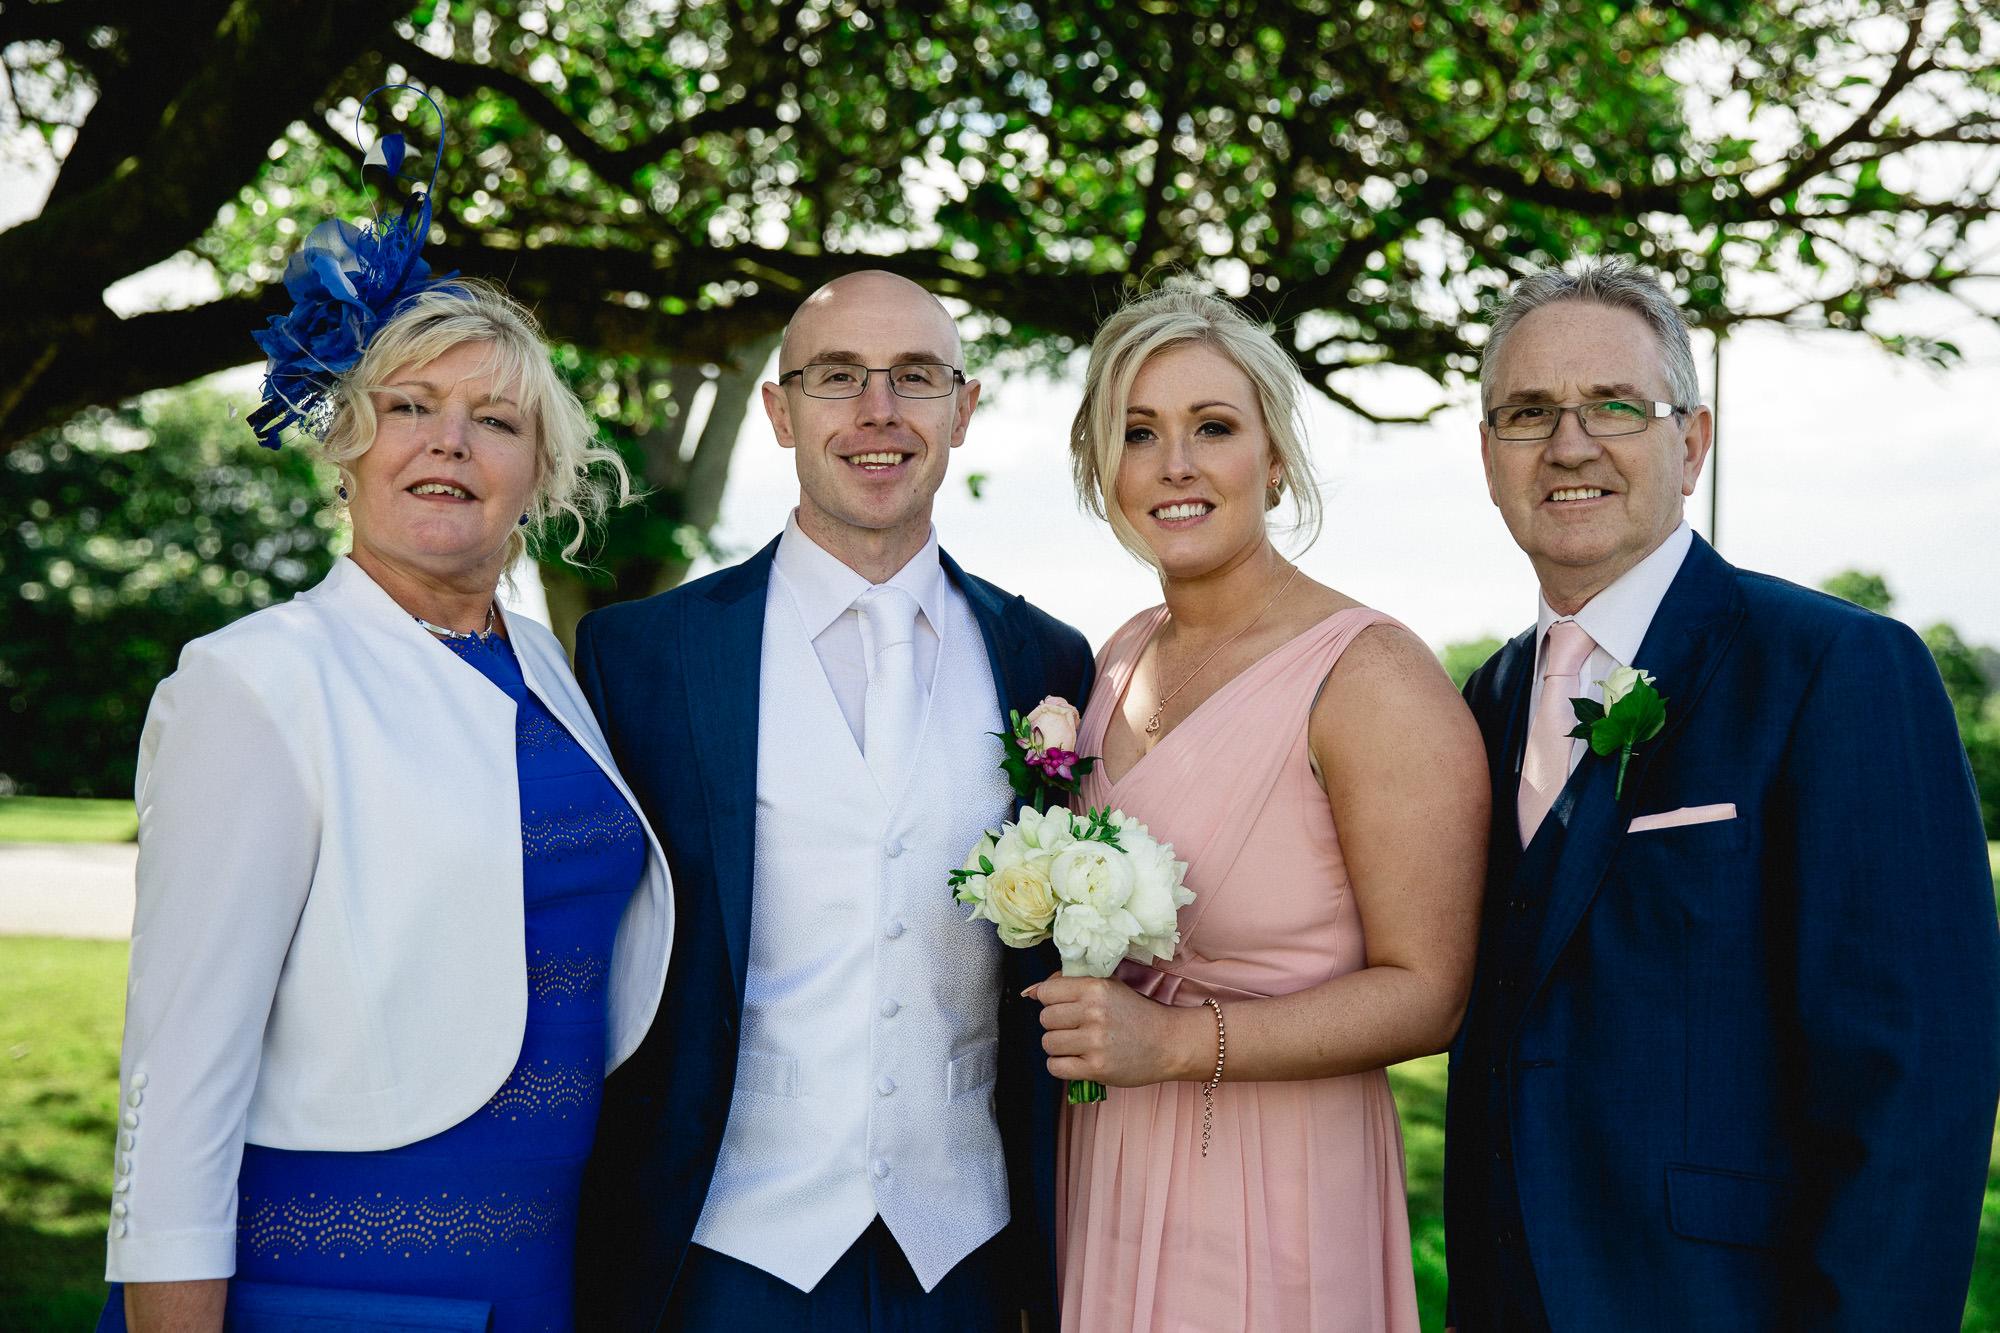 CLAIREBYRNEPHOTOGRAPHY-WEDDING-Ireland-tulffaris-alternative-fun-Lisa-terry-28.jpg